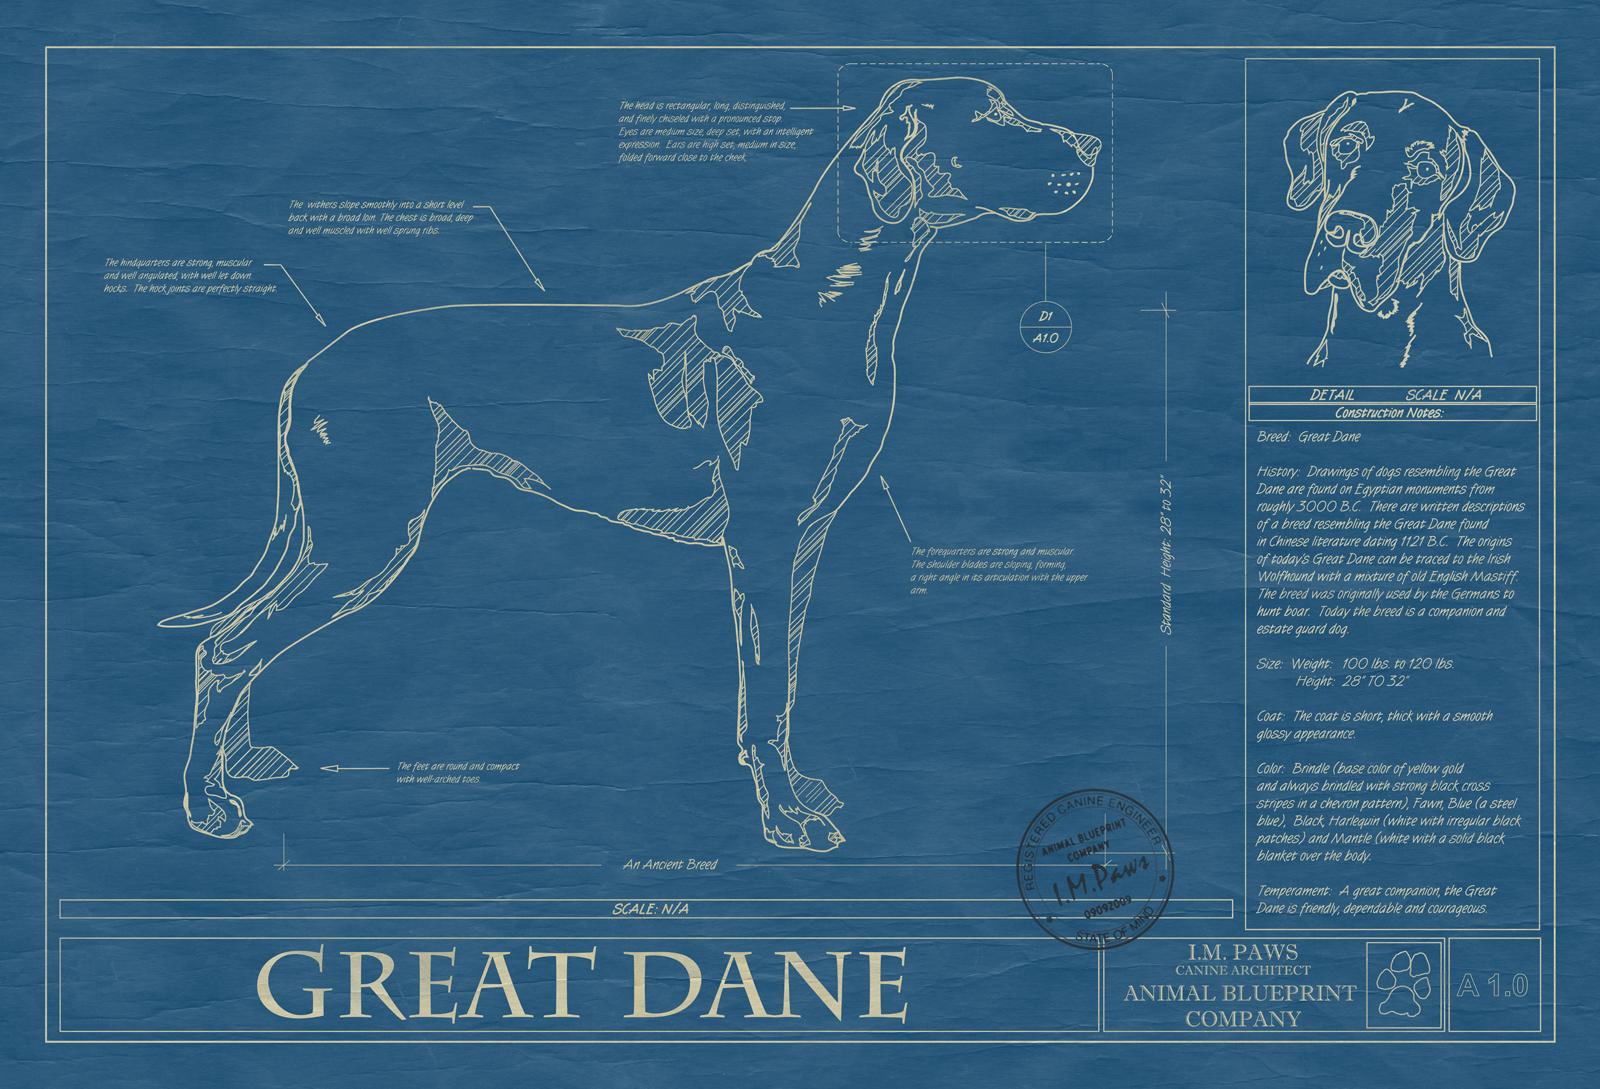 Great dane animal blueprint company great dane dog blueprint malvernweather Gallery